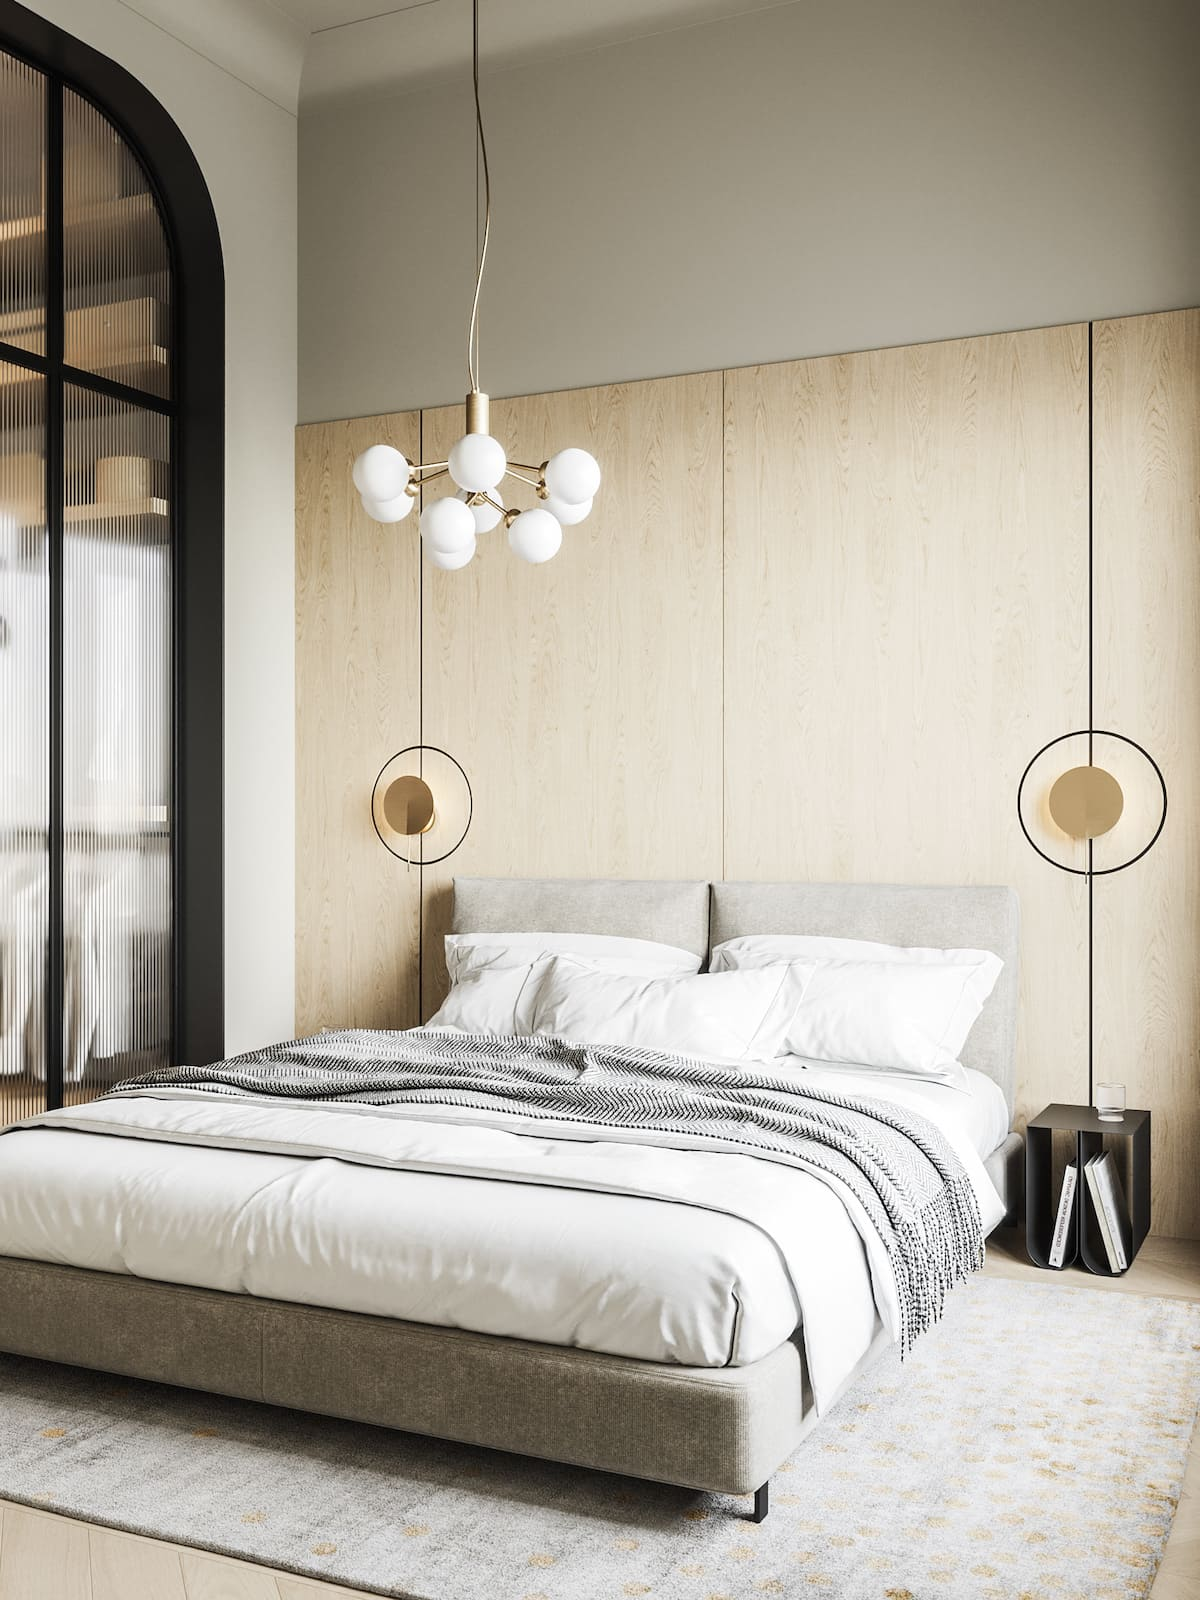 дизайн интерьера модной квартиры фото 28